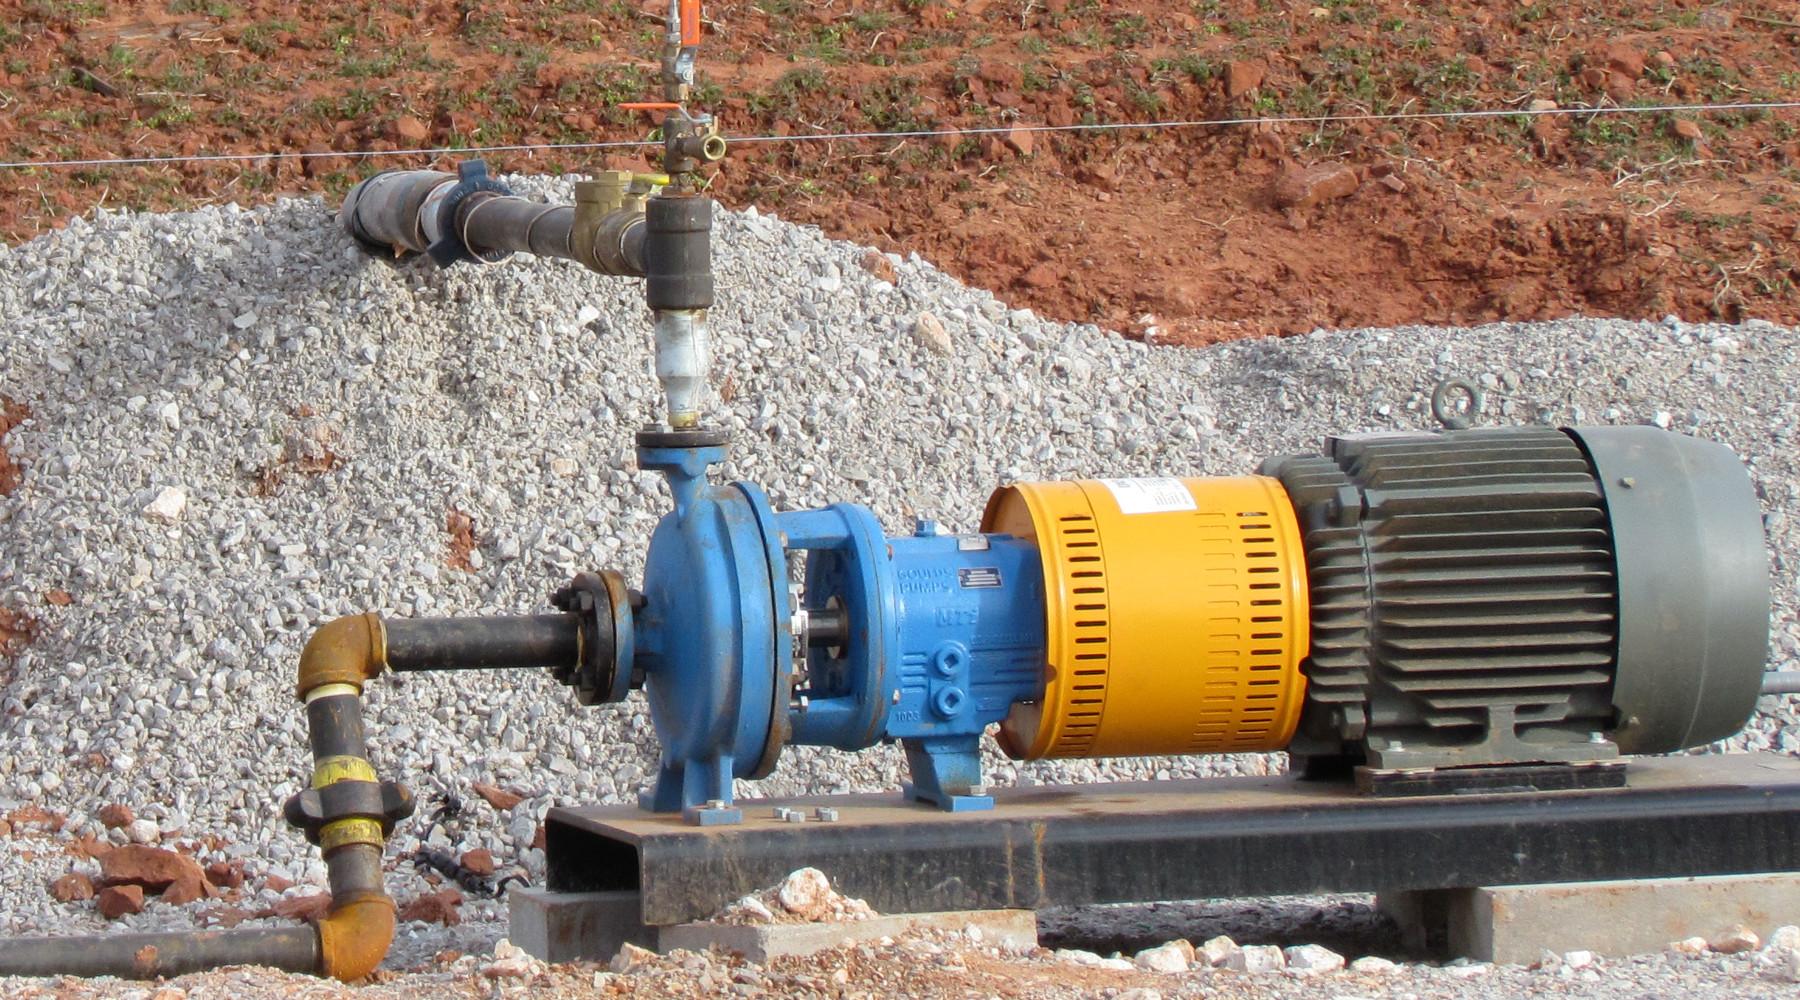 Horizontal_Pump_Plow_Technologies